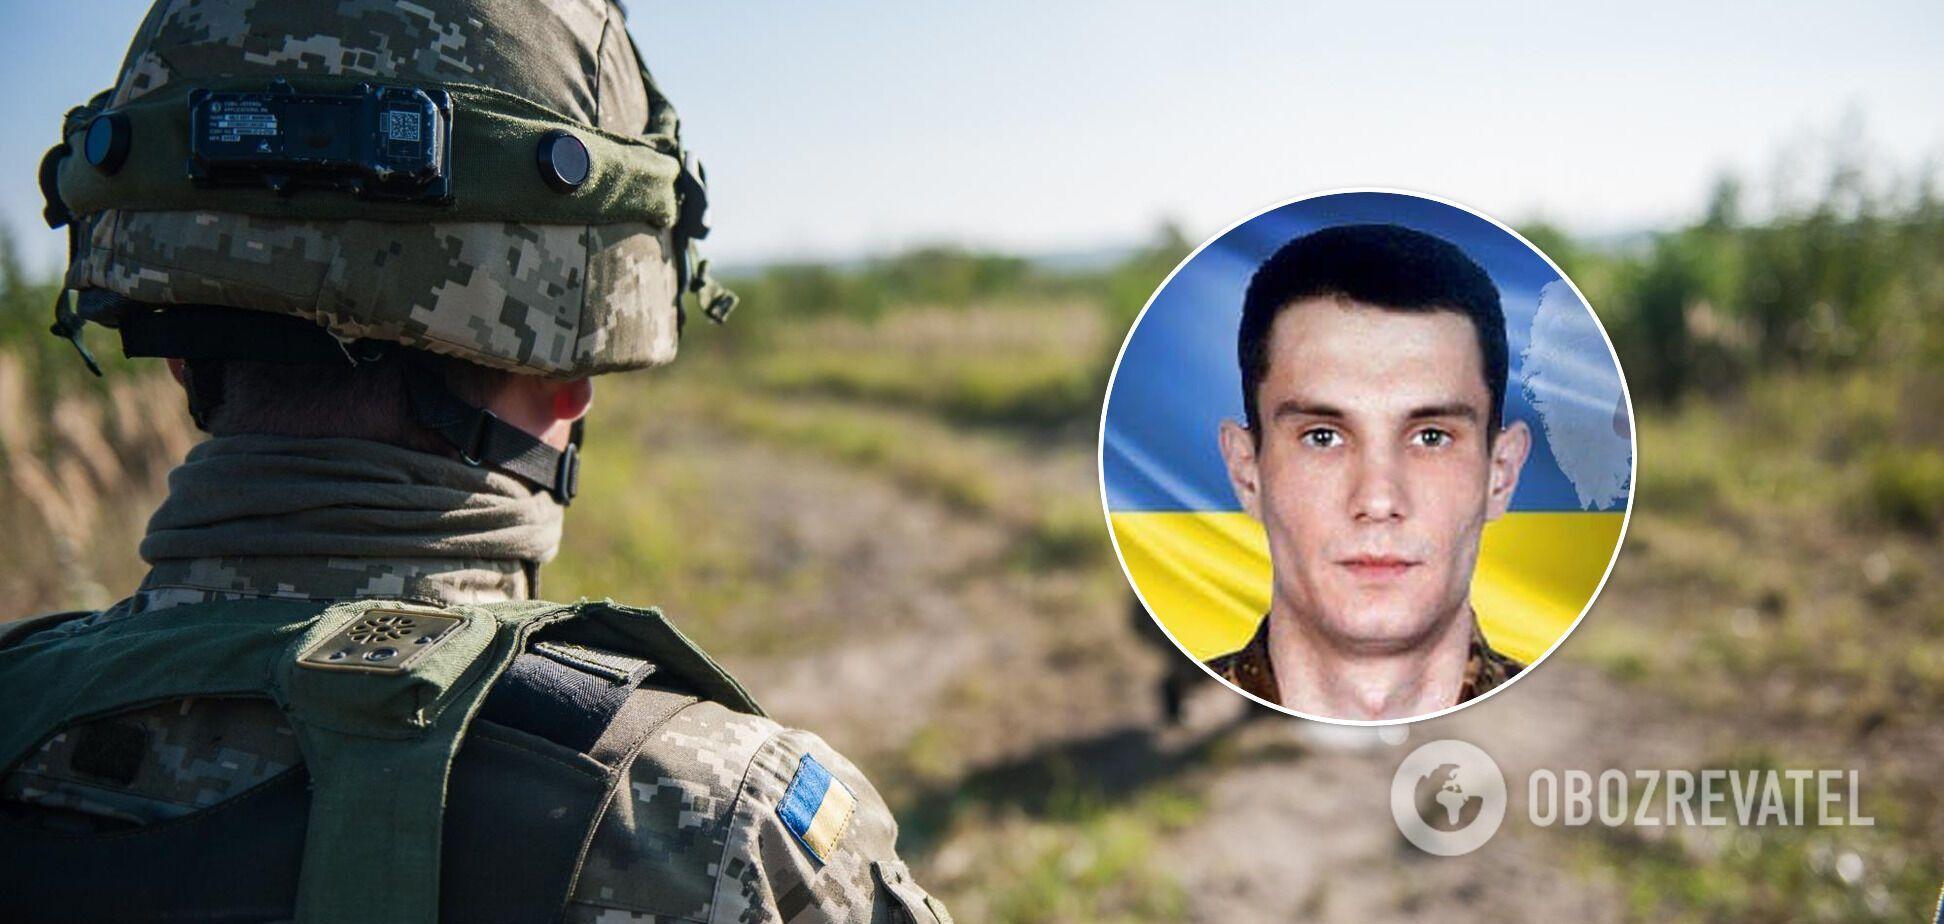 Александр Горбенко скончался от ранений, полученных на Донбассе